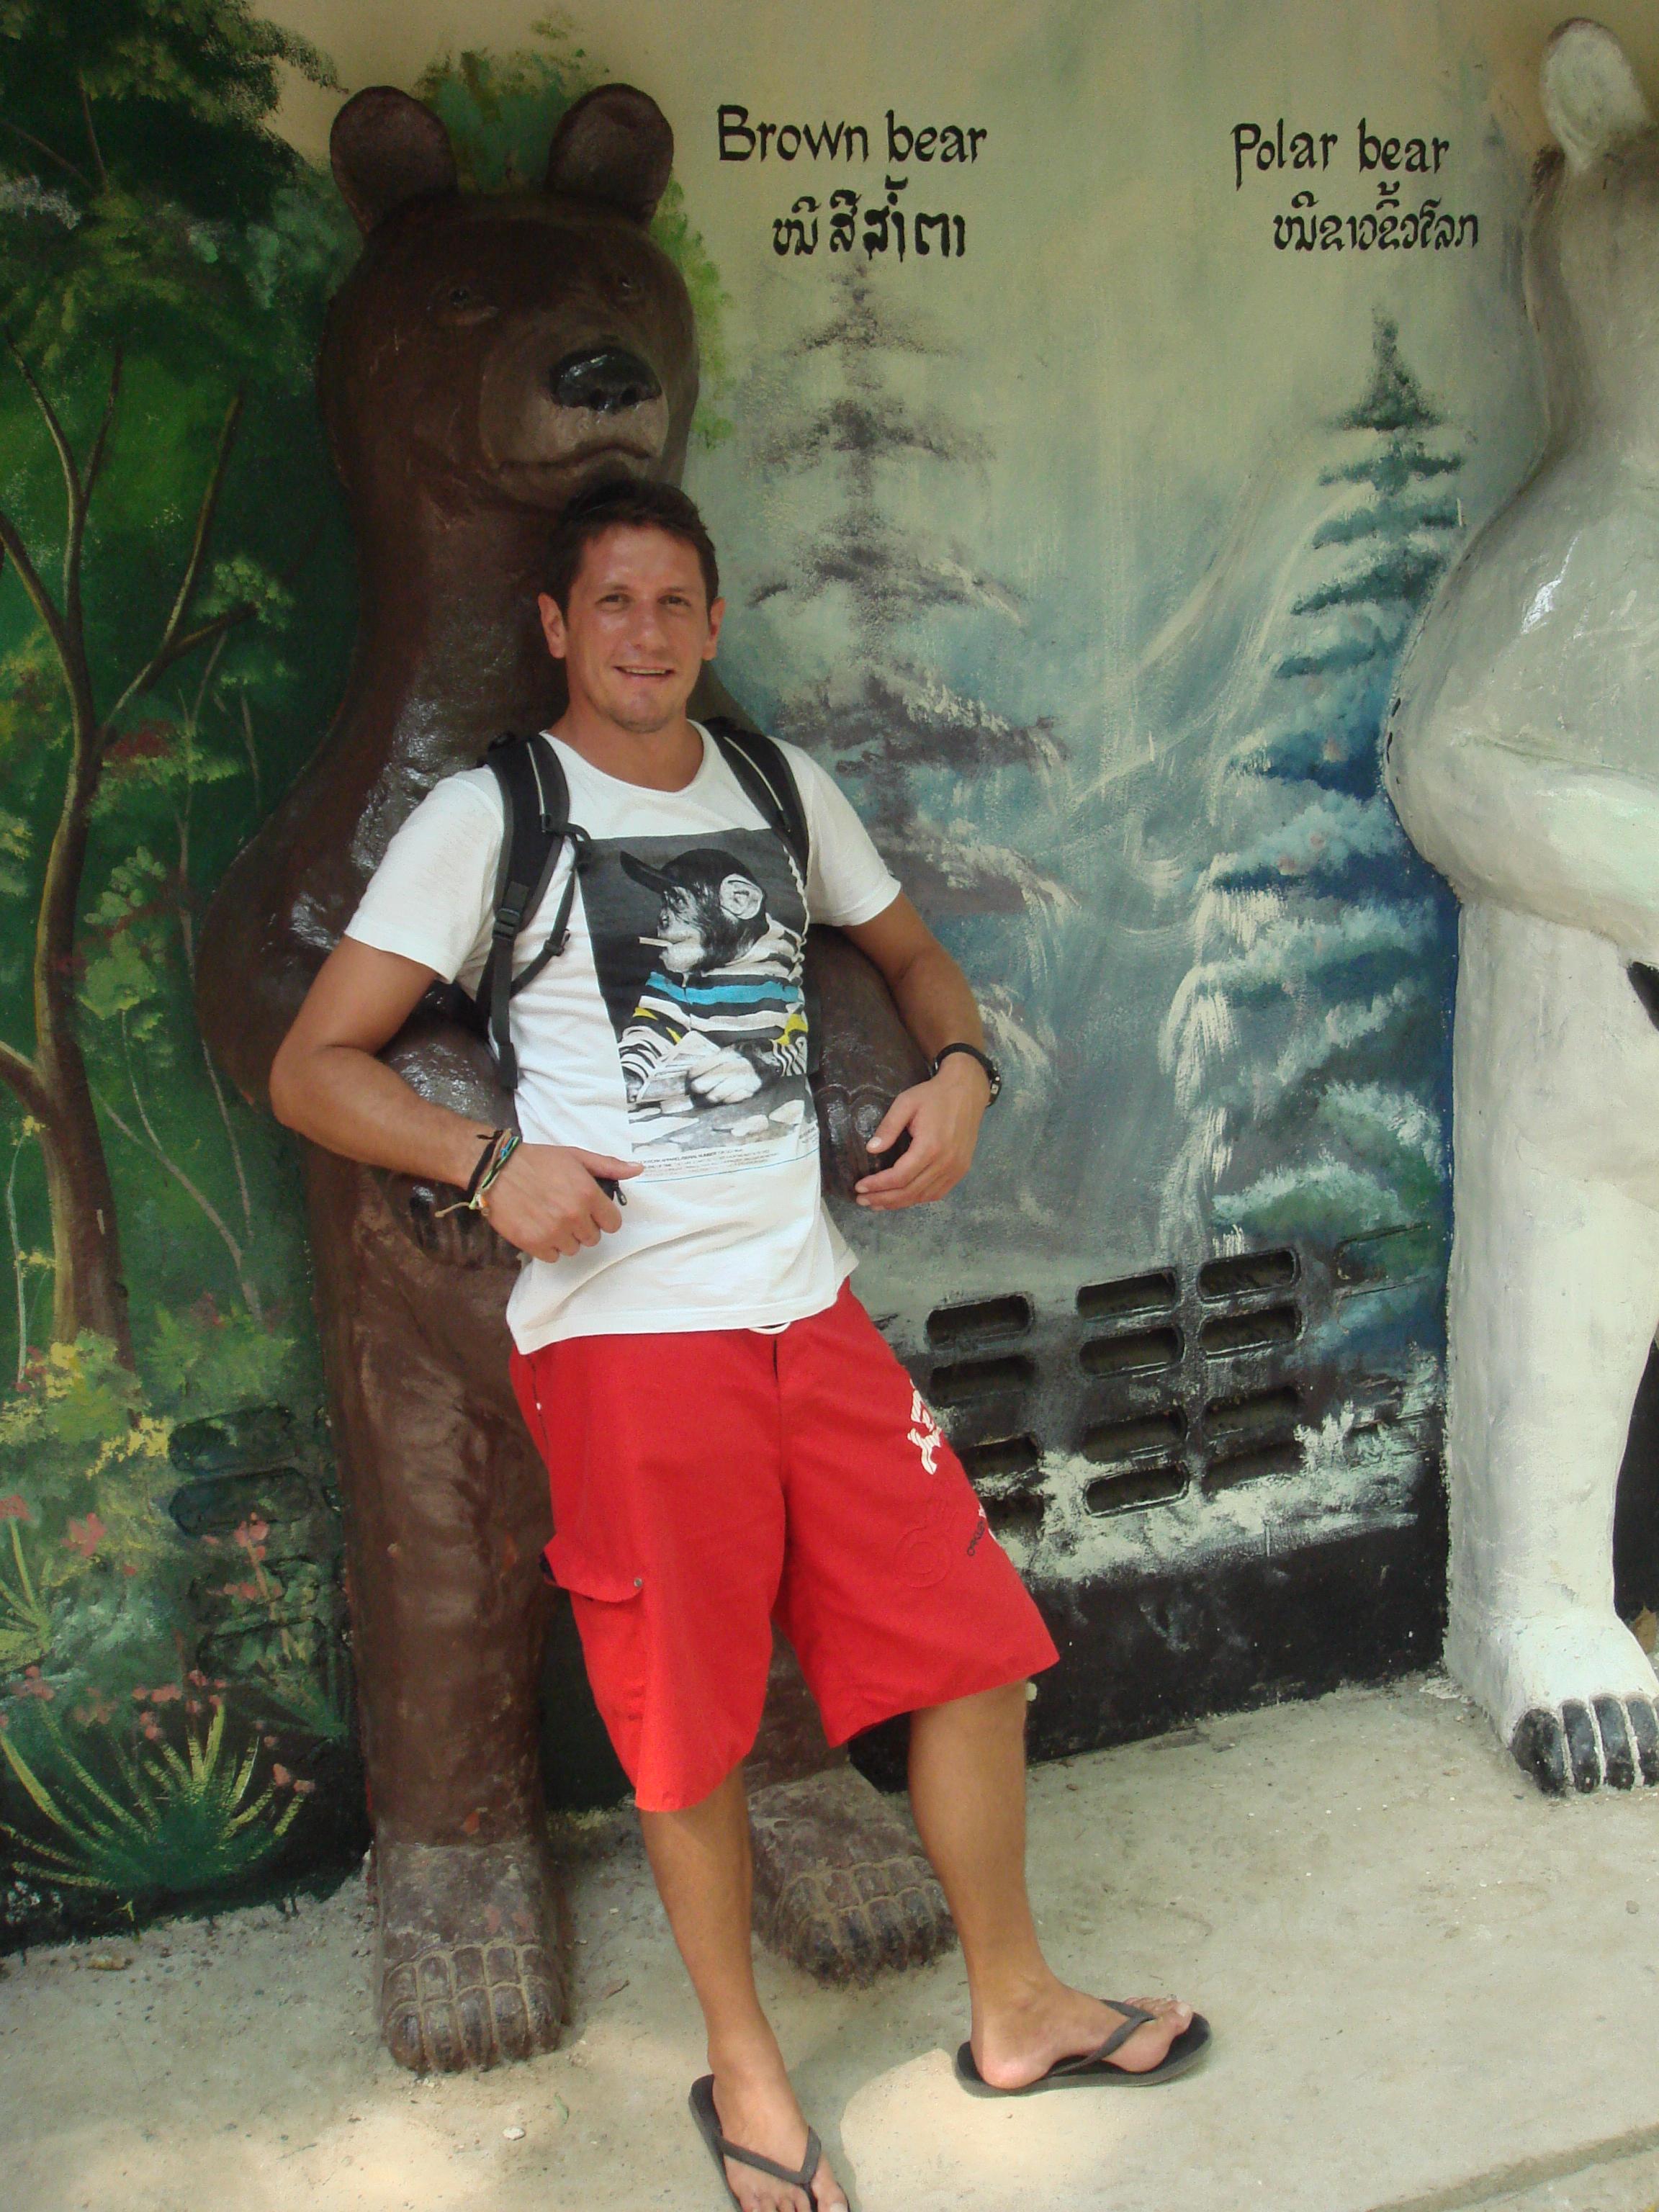 Travel Journal - The 2 bears